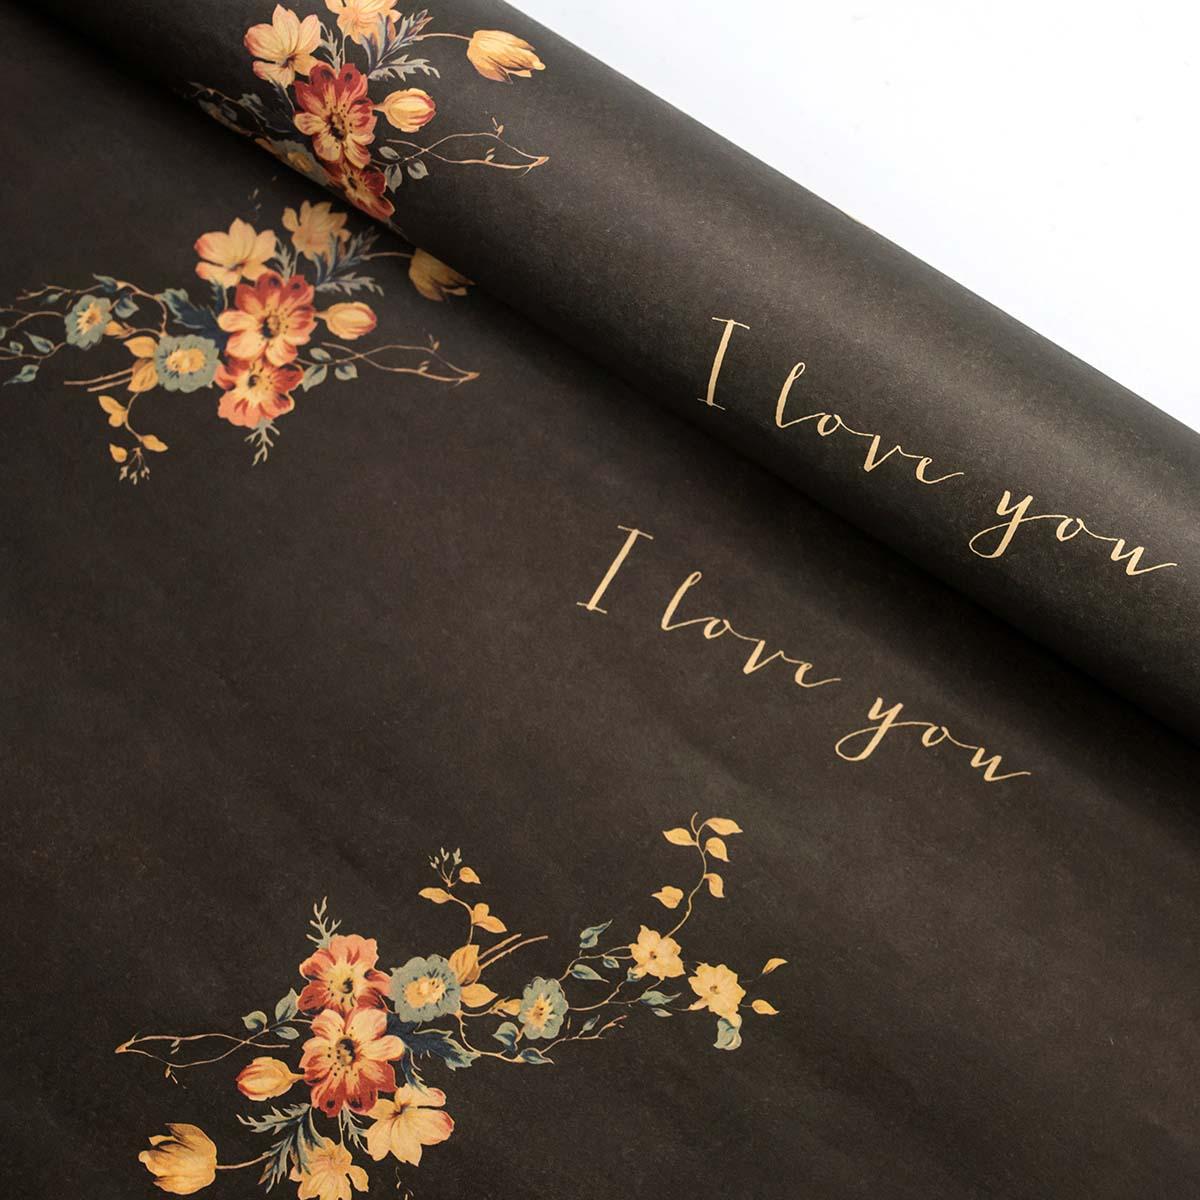 Бумага цветная 'Мелкие цветы' 60х60см